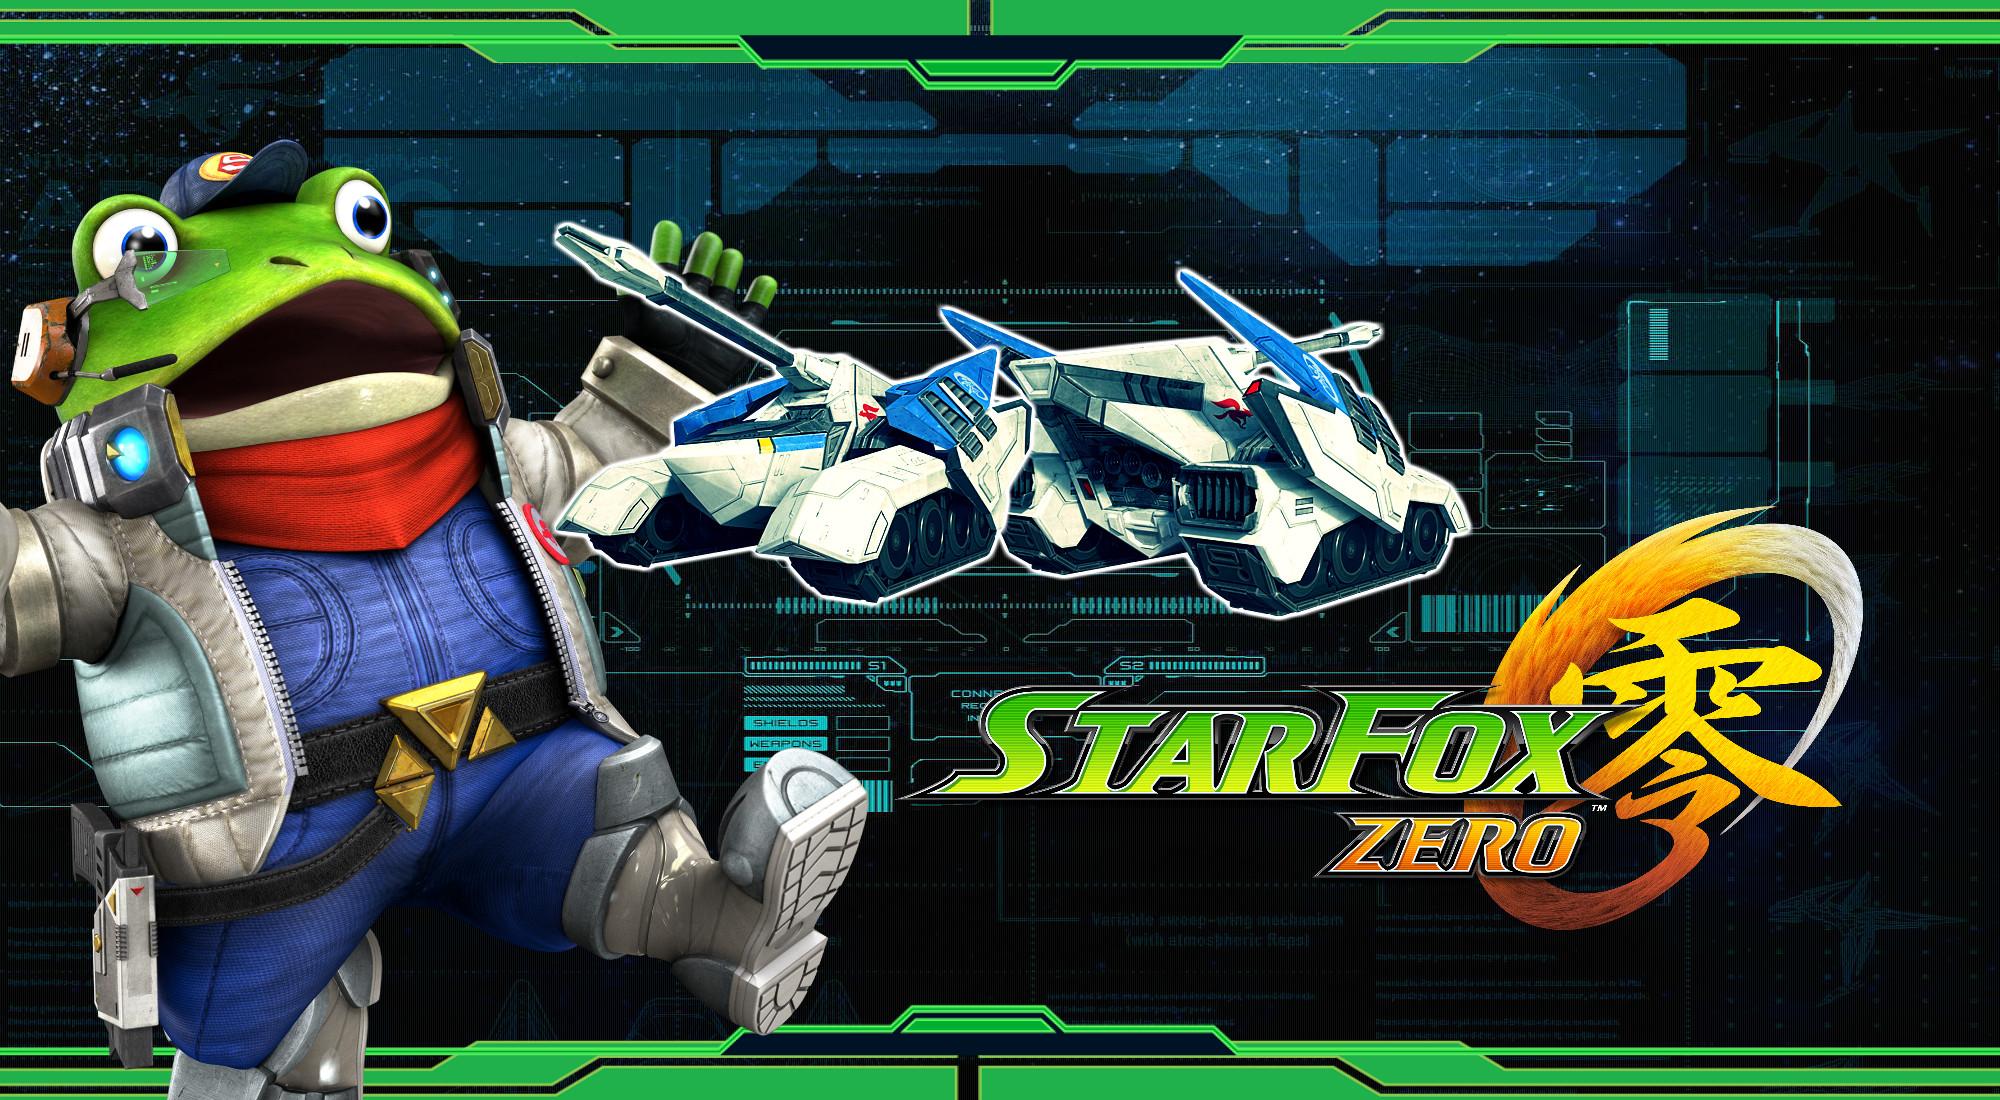 … Star Fox Zero – Landmaster Wallpaper by DaKidGaming